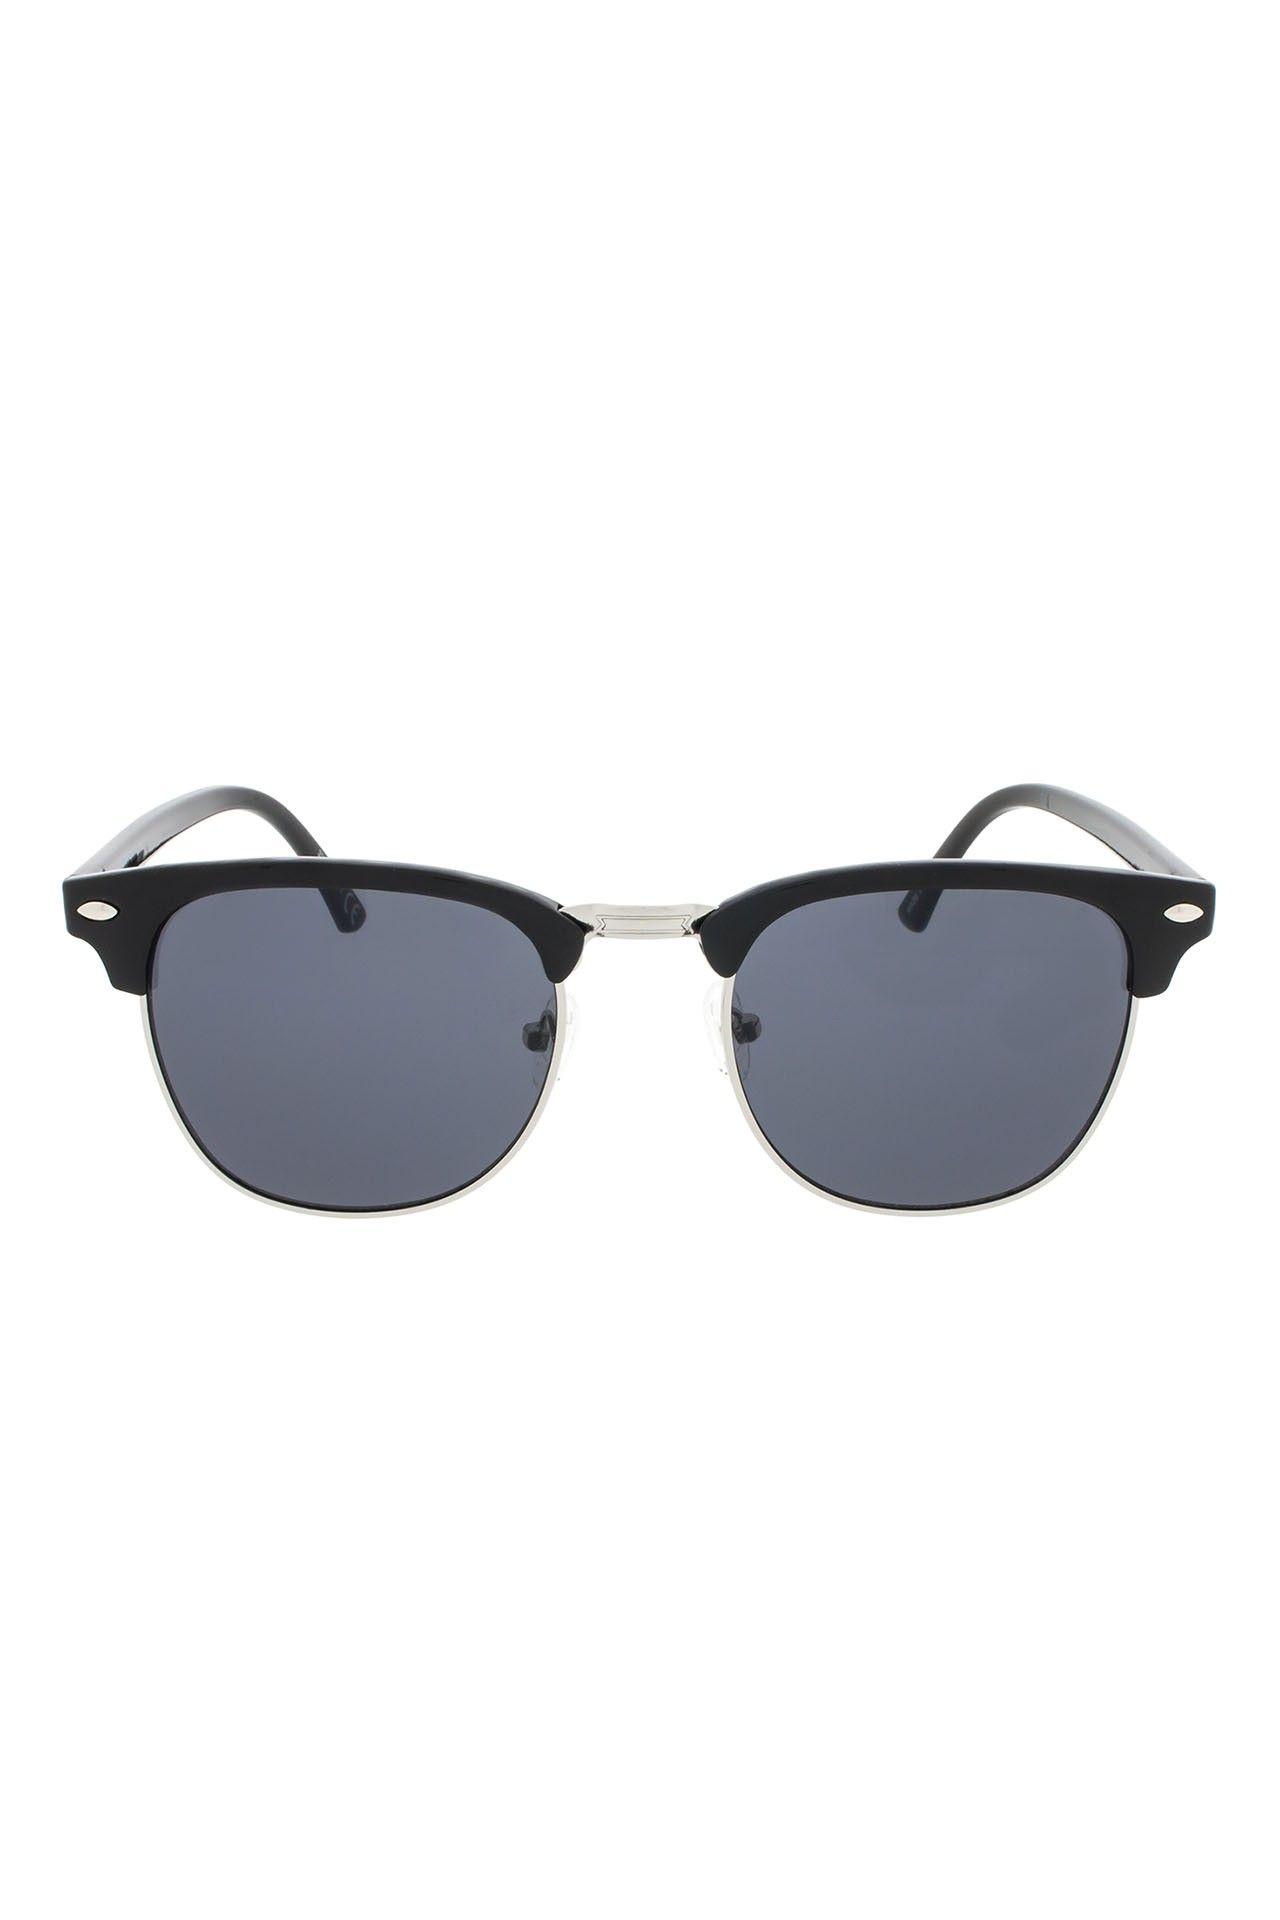 Afbeelding van Icon Eyewear 3211-L A Zonnebril Black